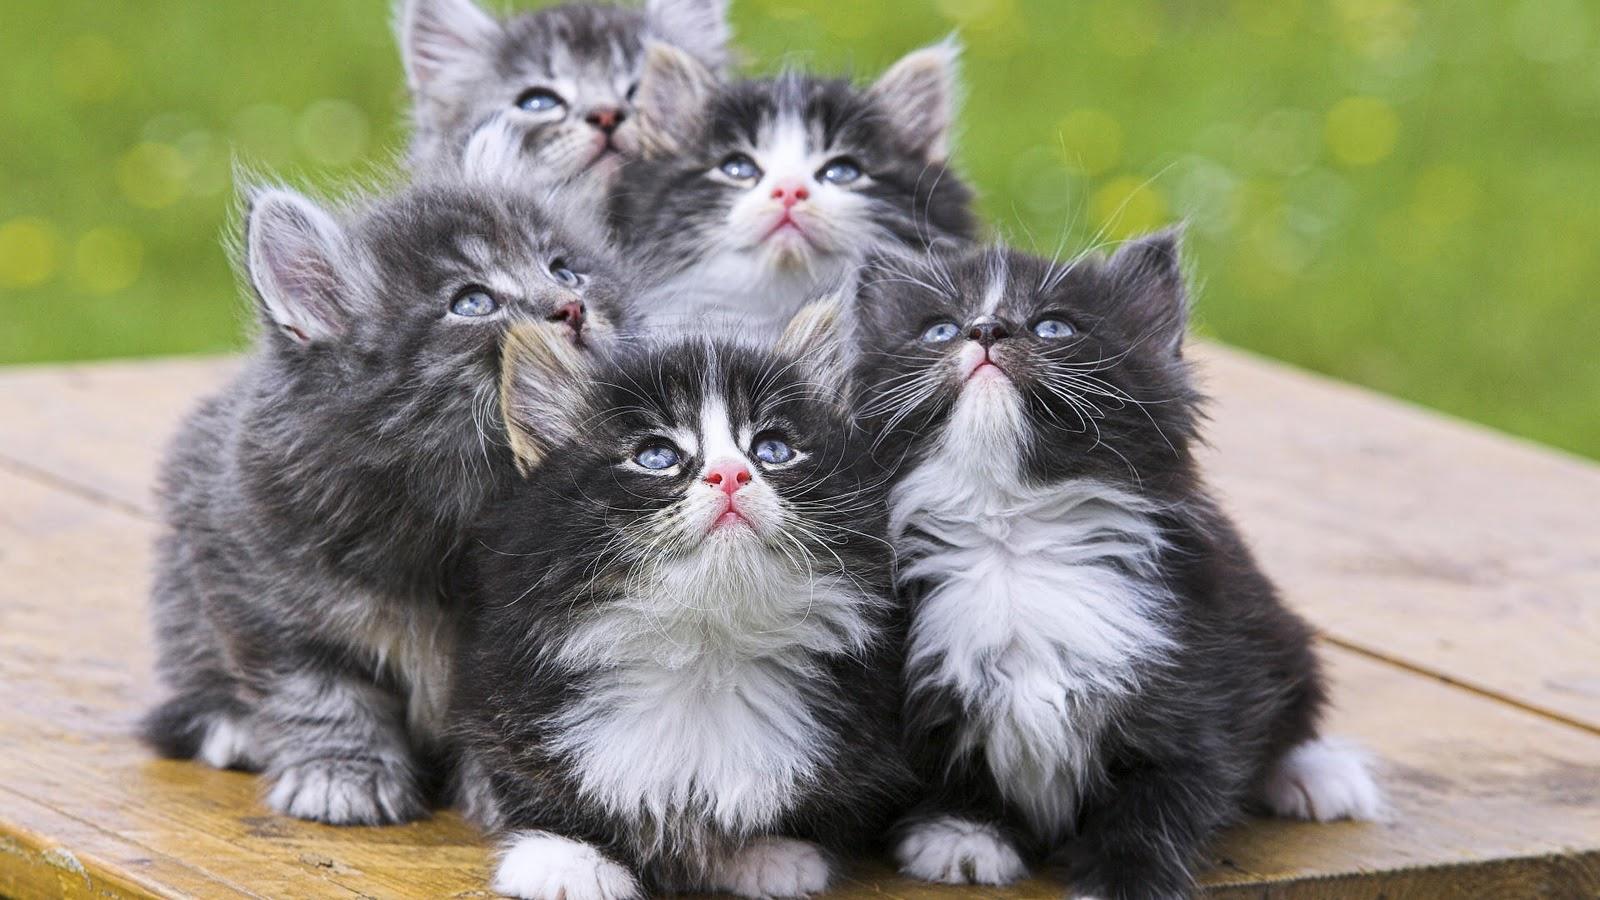 Kitten achtergronden jonge katjes hd kittens wallpapers foto 2jpg 1600x900